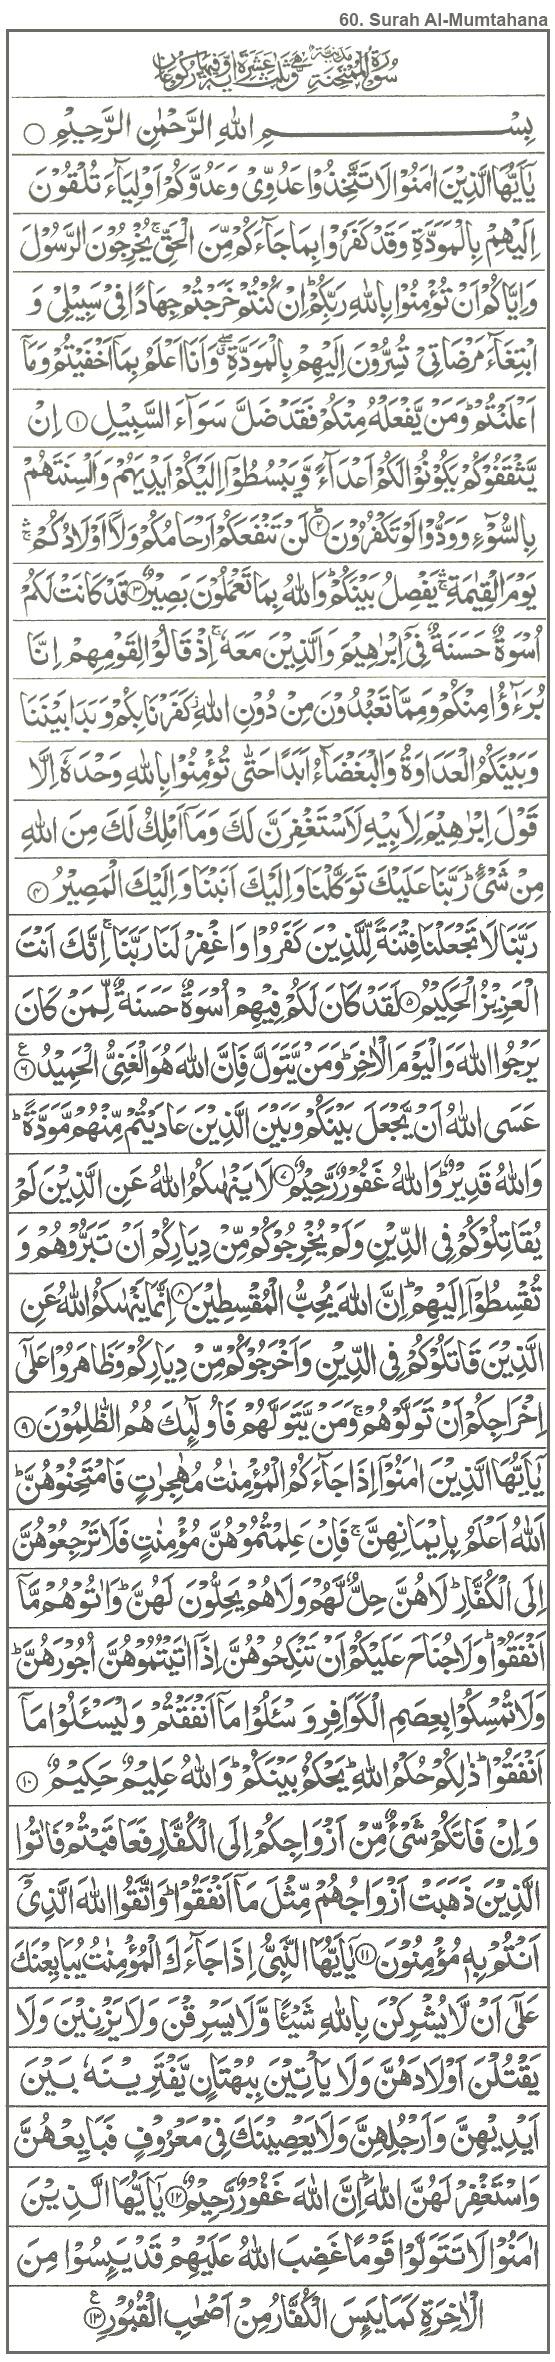 Surah Al-Mumtahana